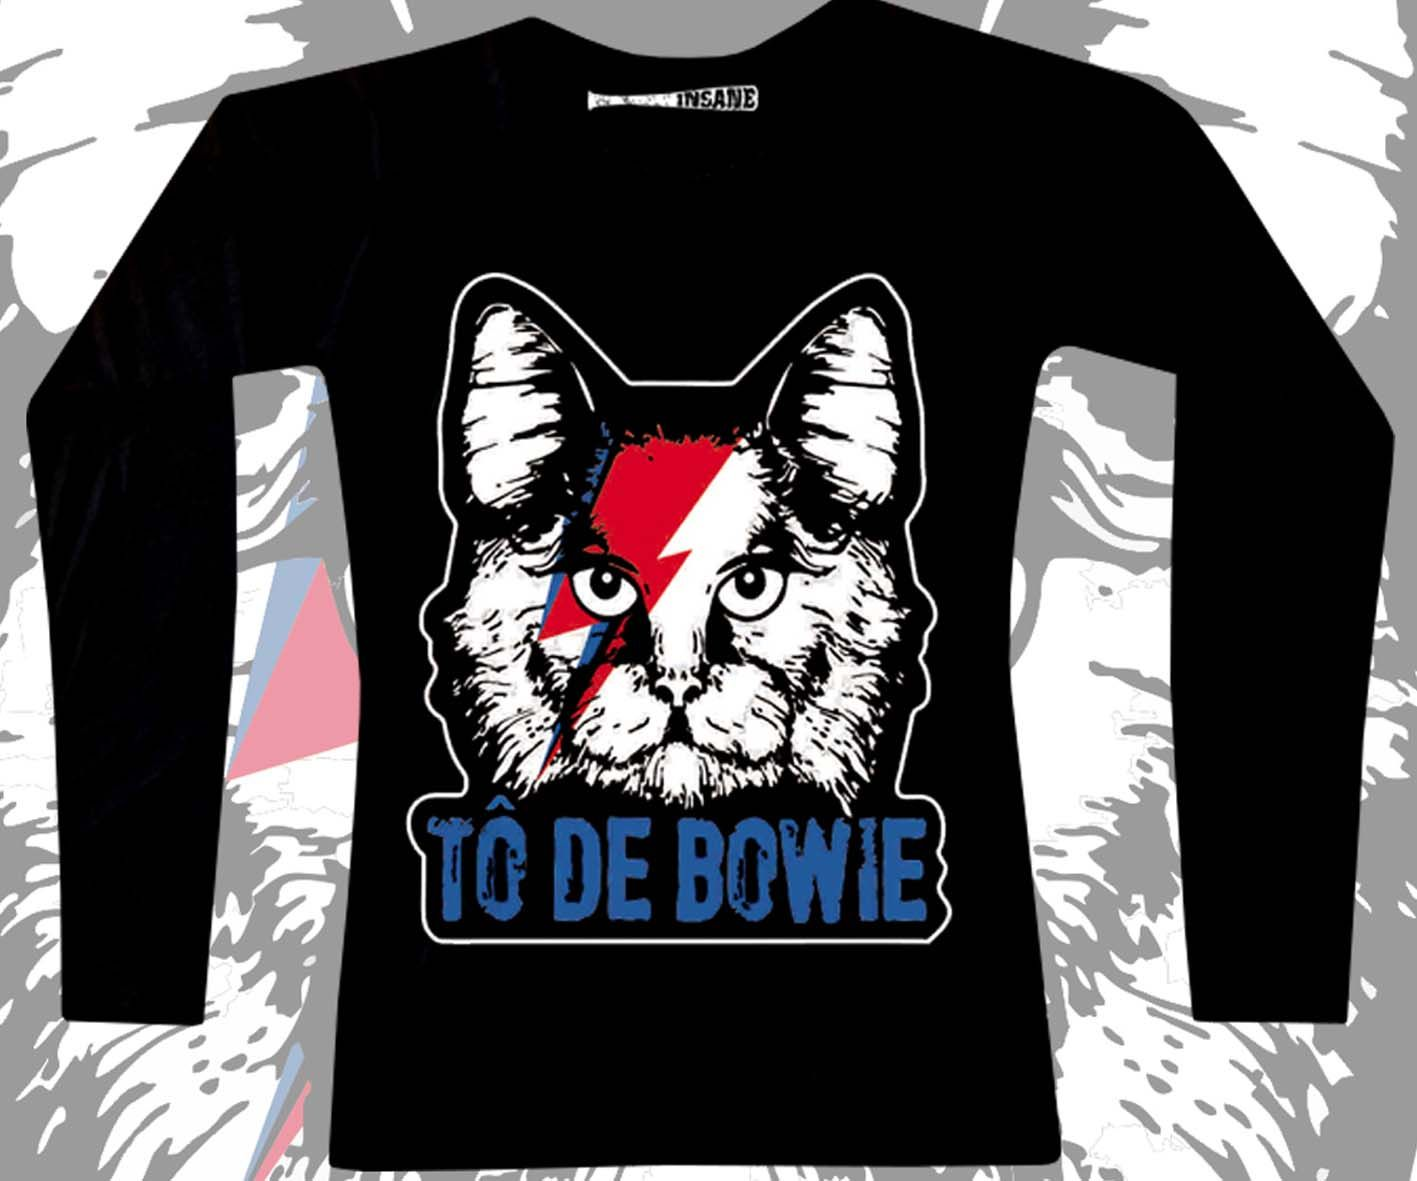 Manga Longa Fem Tô de Bowie